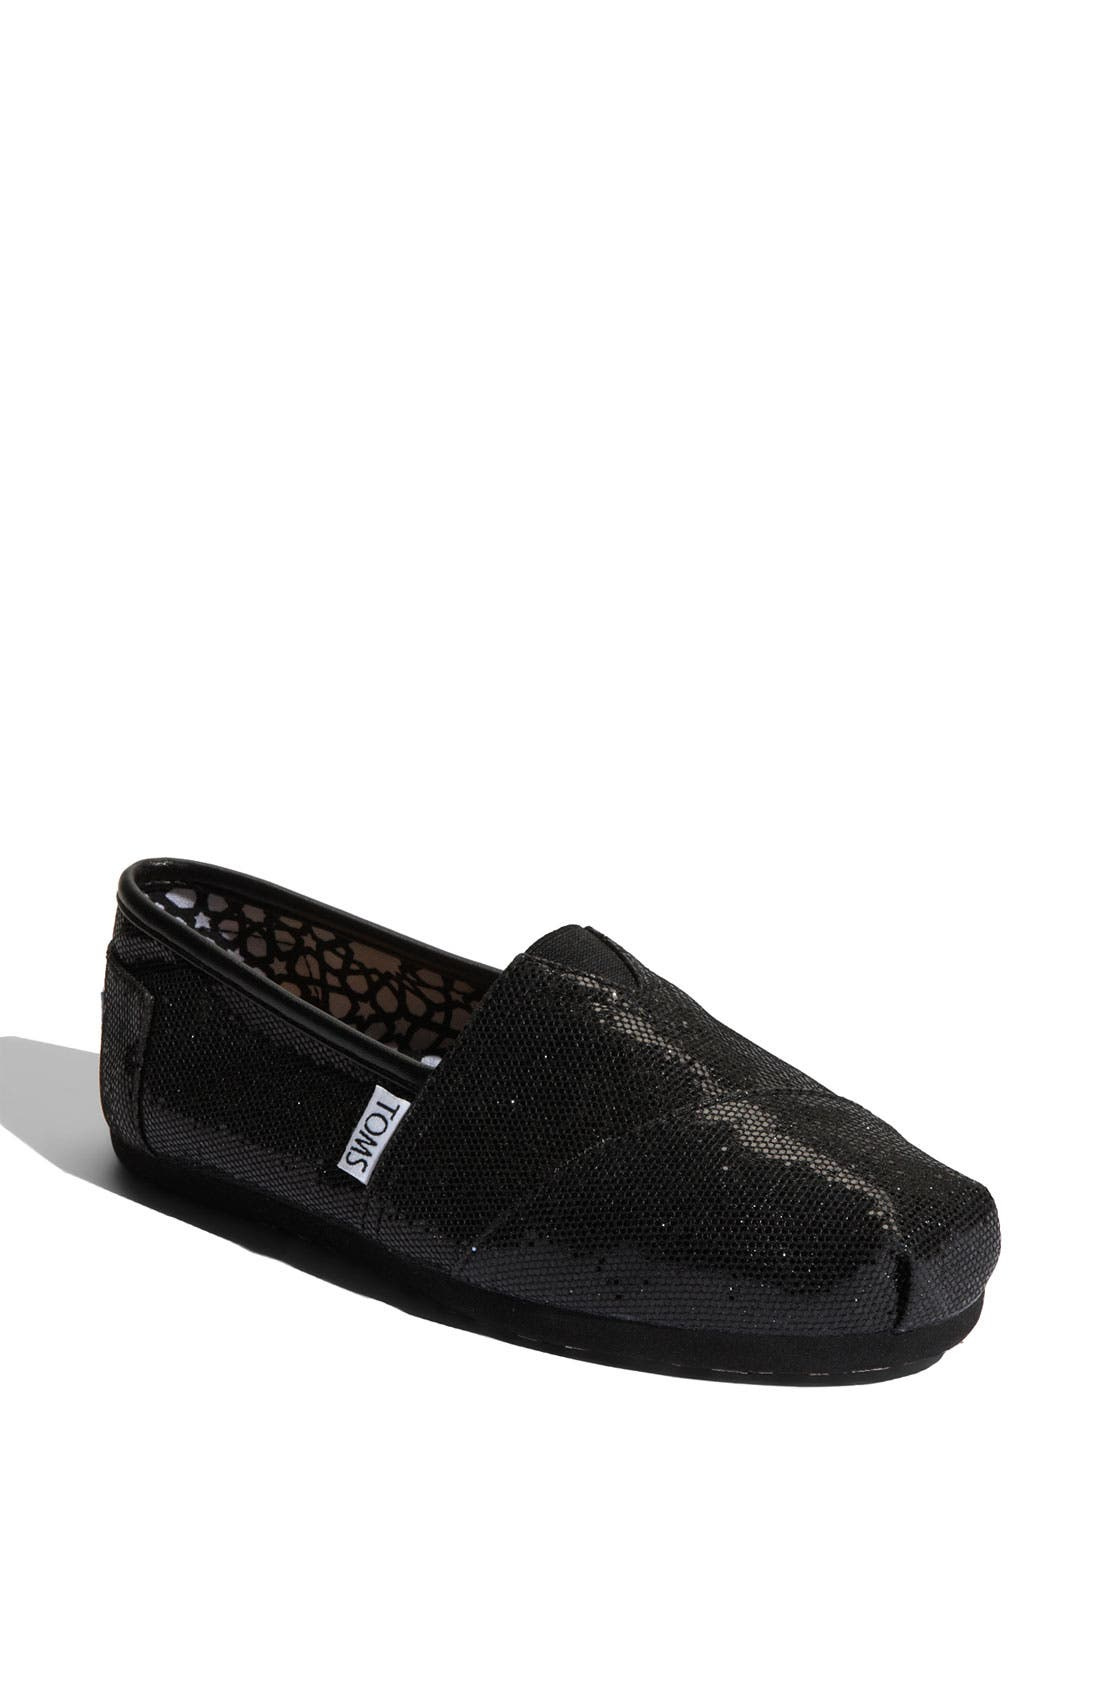 'Classic - Glitter' Slip-On,                         Main,                         color, Black